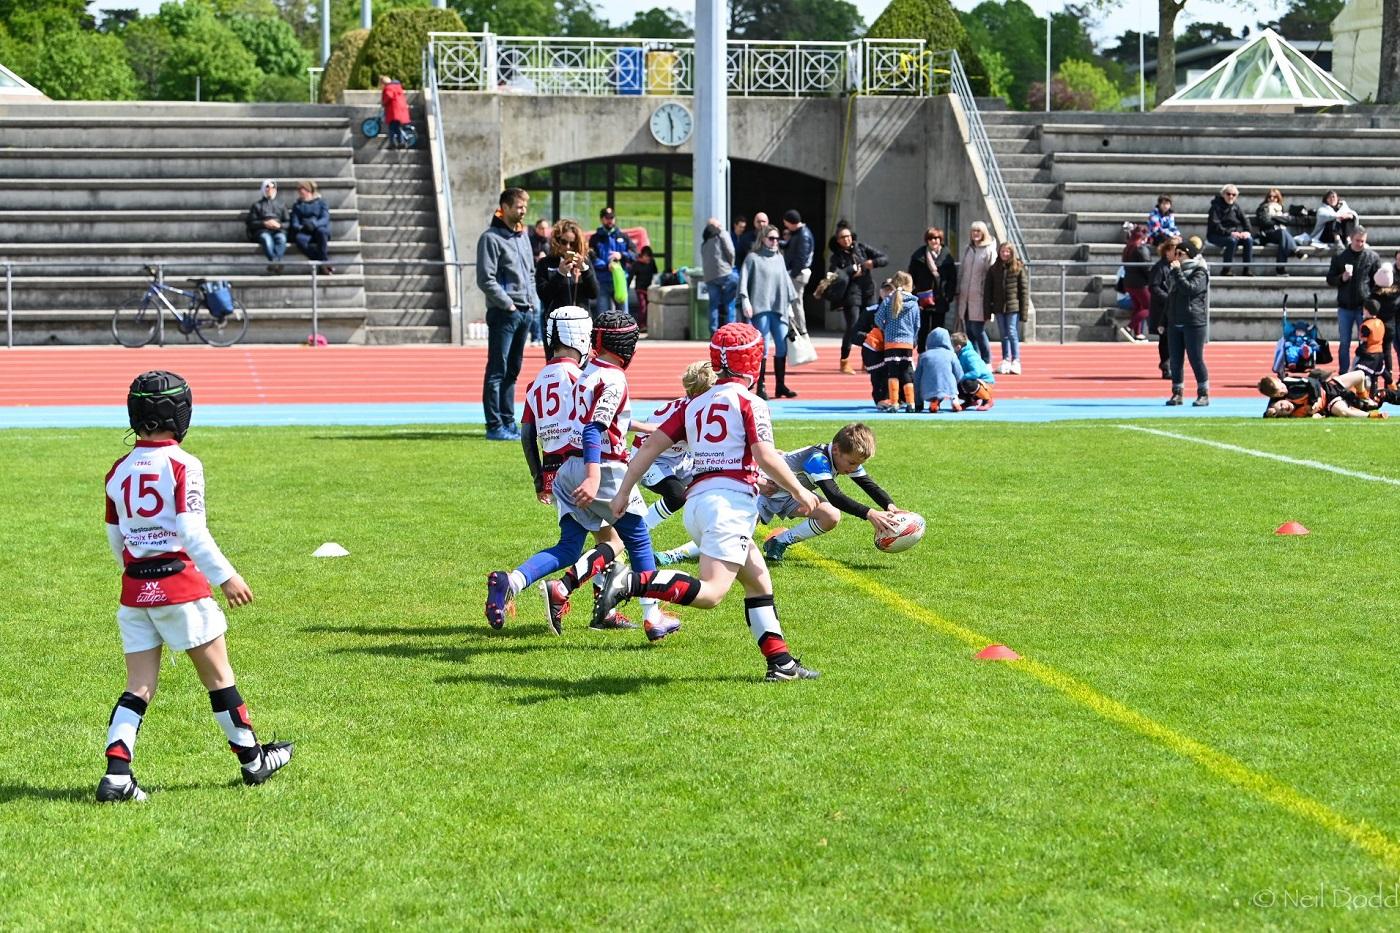 Terre Sainte Rugby